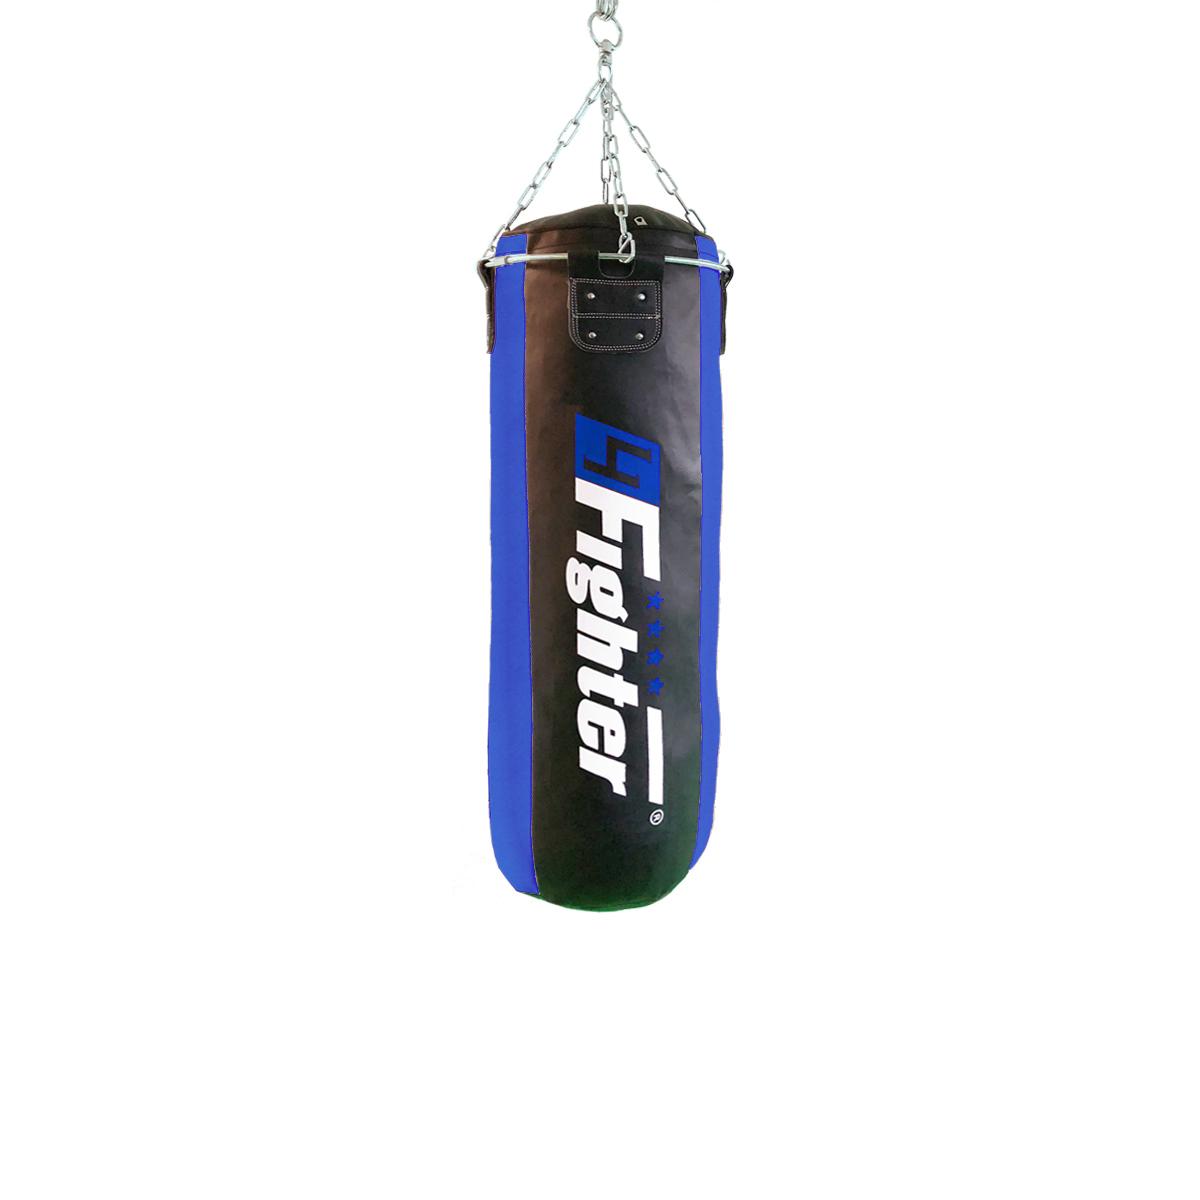 4Fighter Profi Kunstleder Boxsack / Sandsack - schwarz/blau, gefüllt 100cm